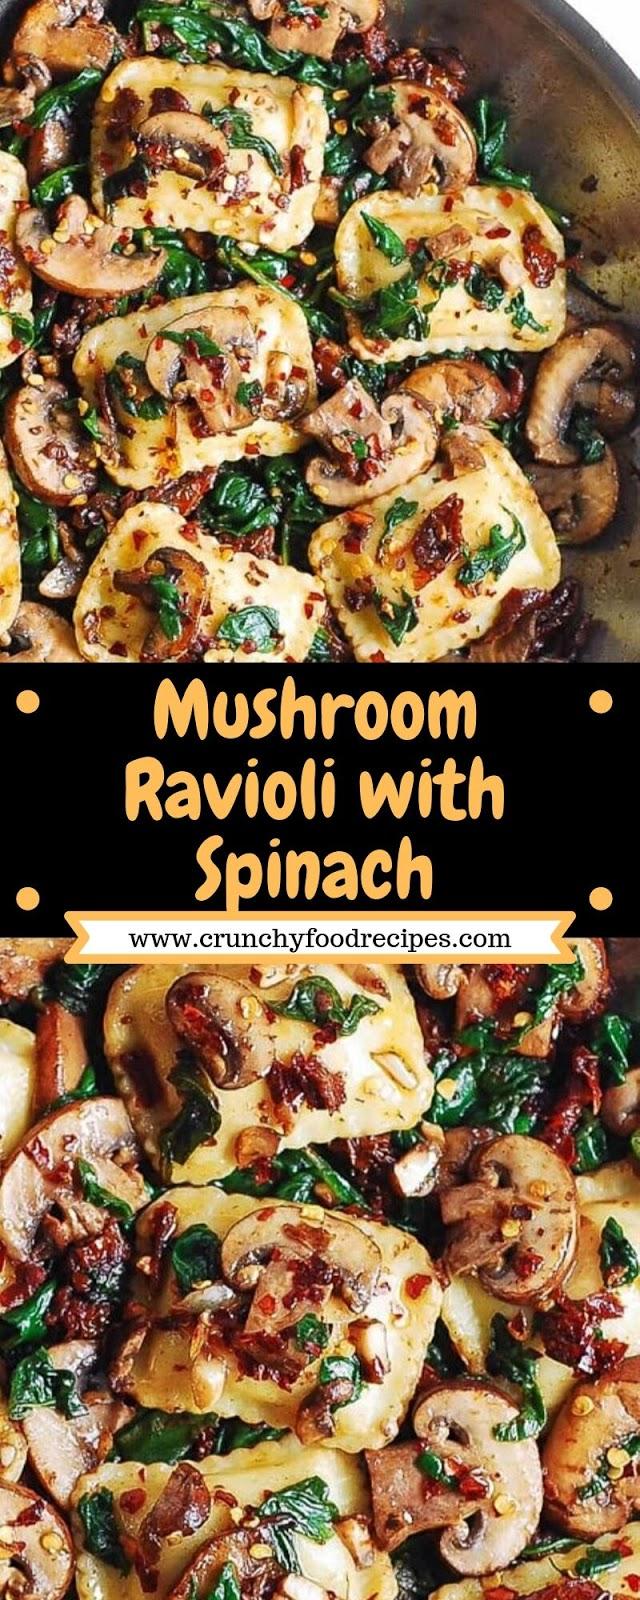 Mushroom Ravioli with Spinach